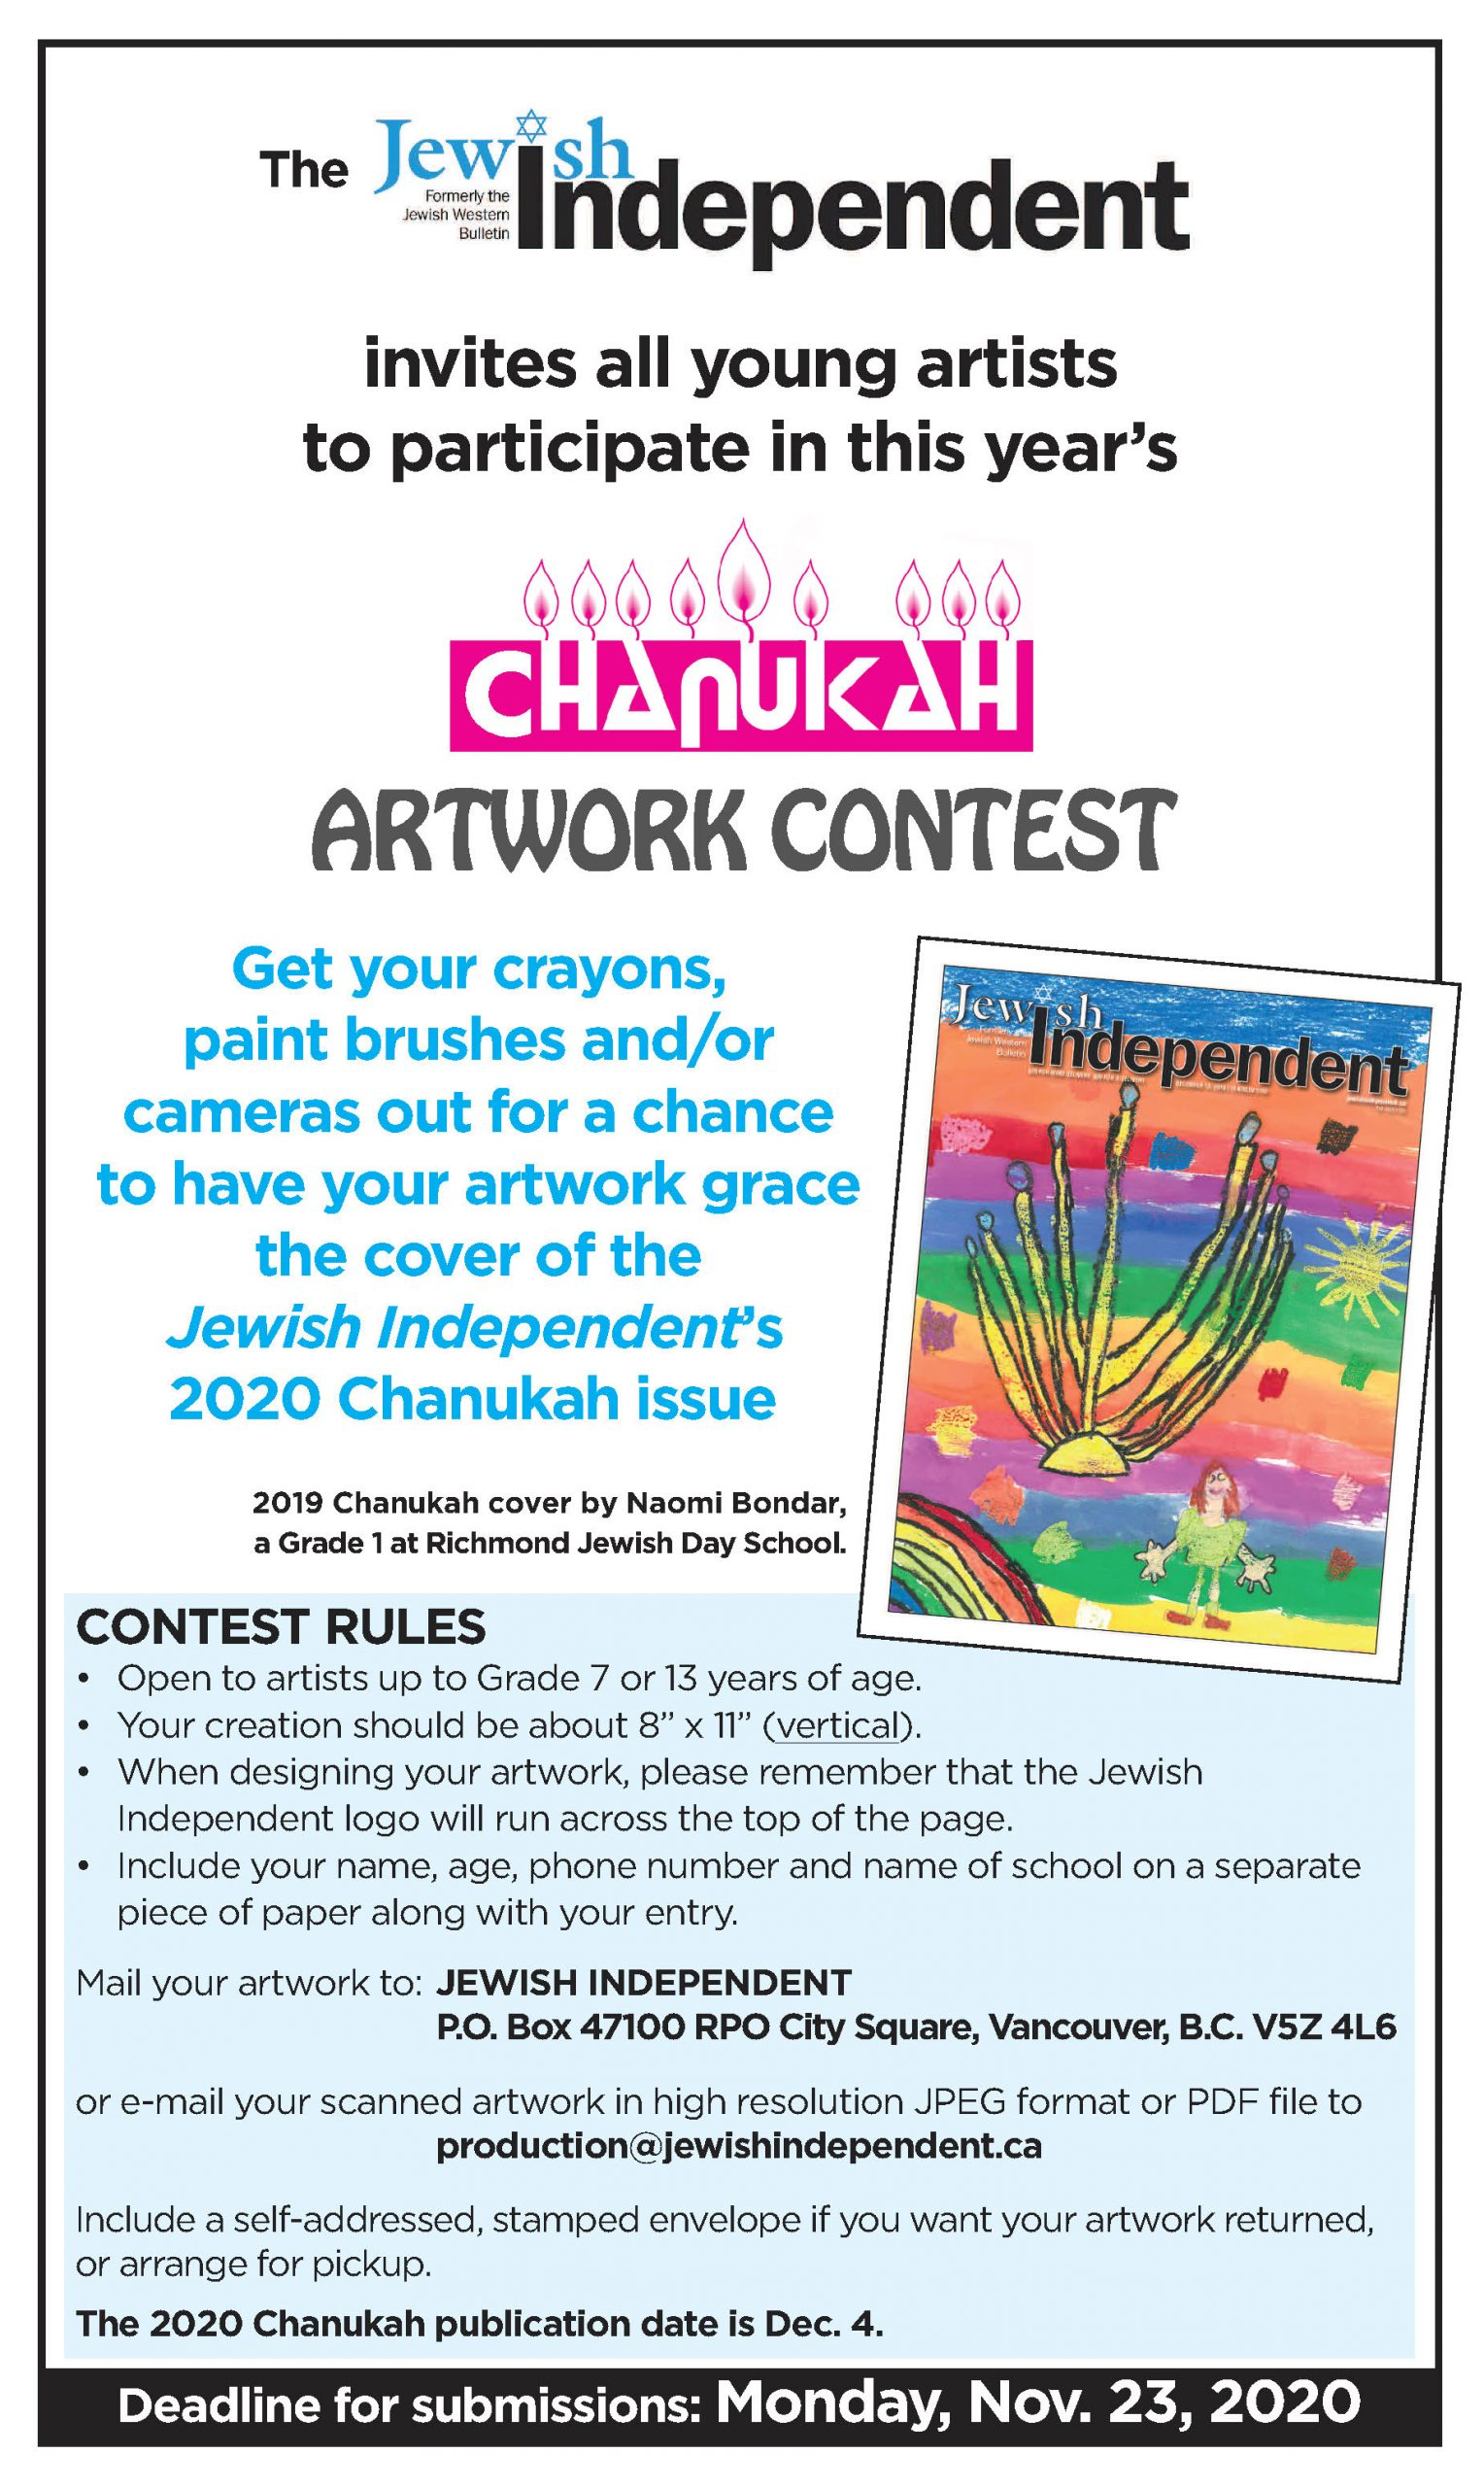 image - 2020 Chanukah Art Contest poster